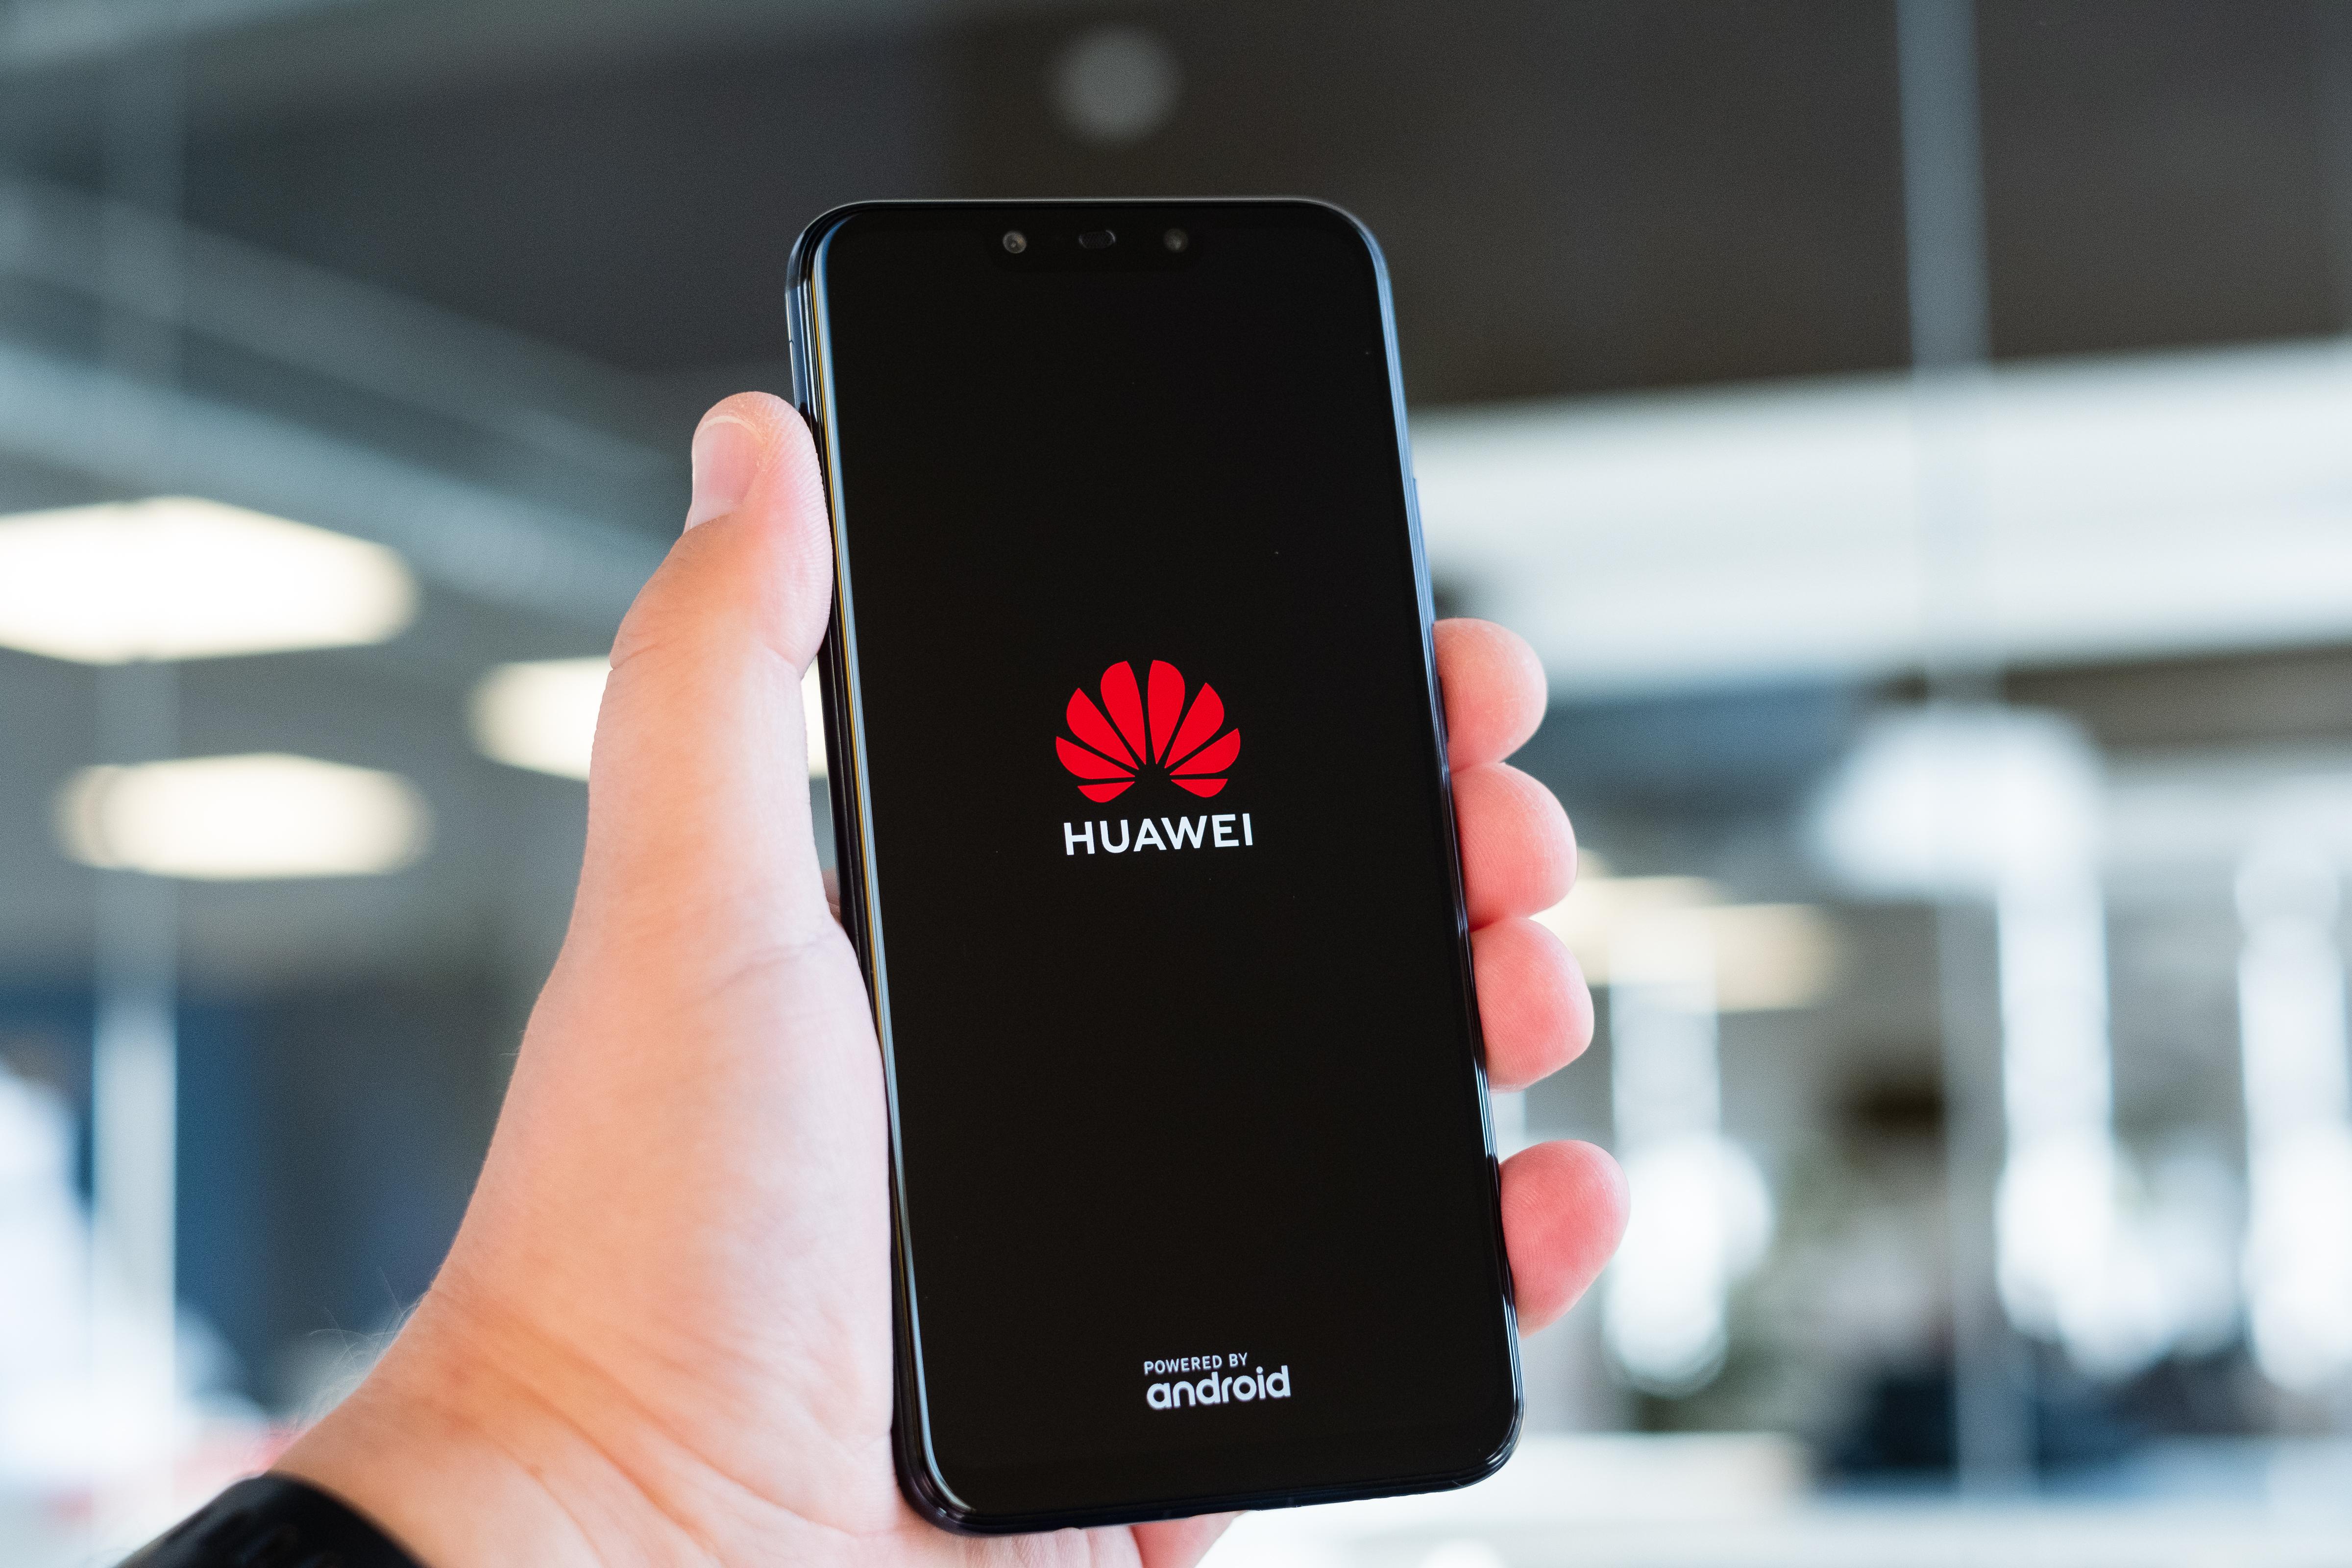 ¡Nuevos celulares Huawei 2018!